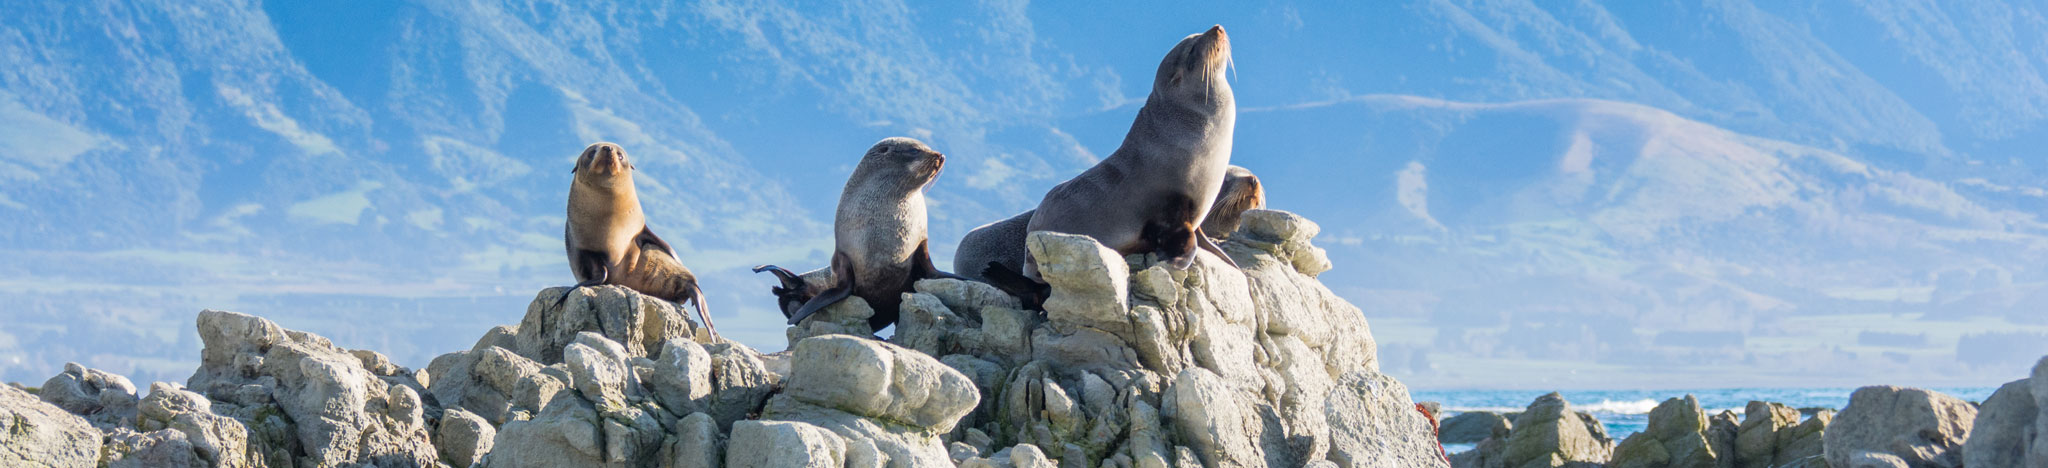 New Zealand Luxury Honeymoon - Romance Vacation